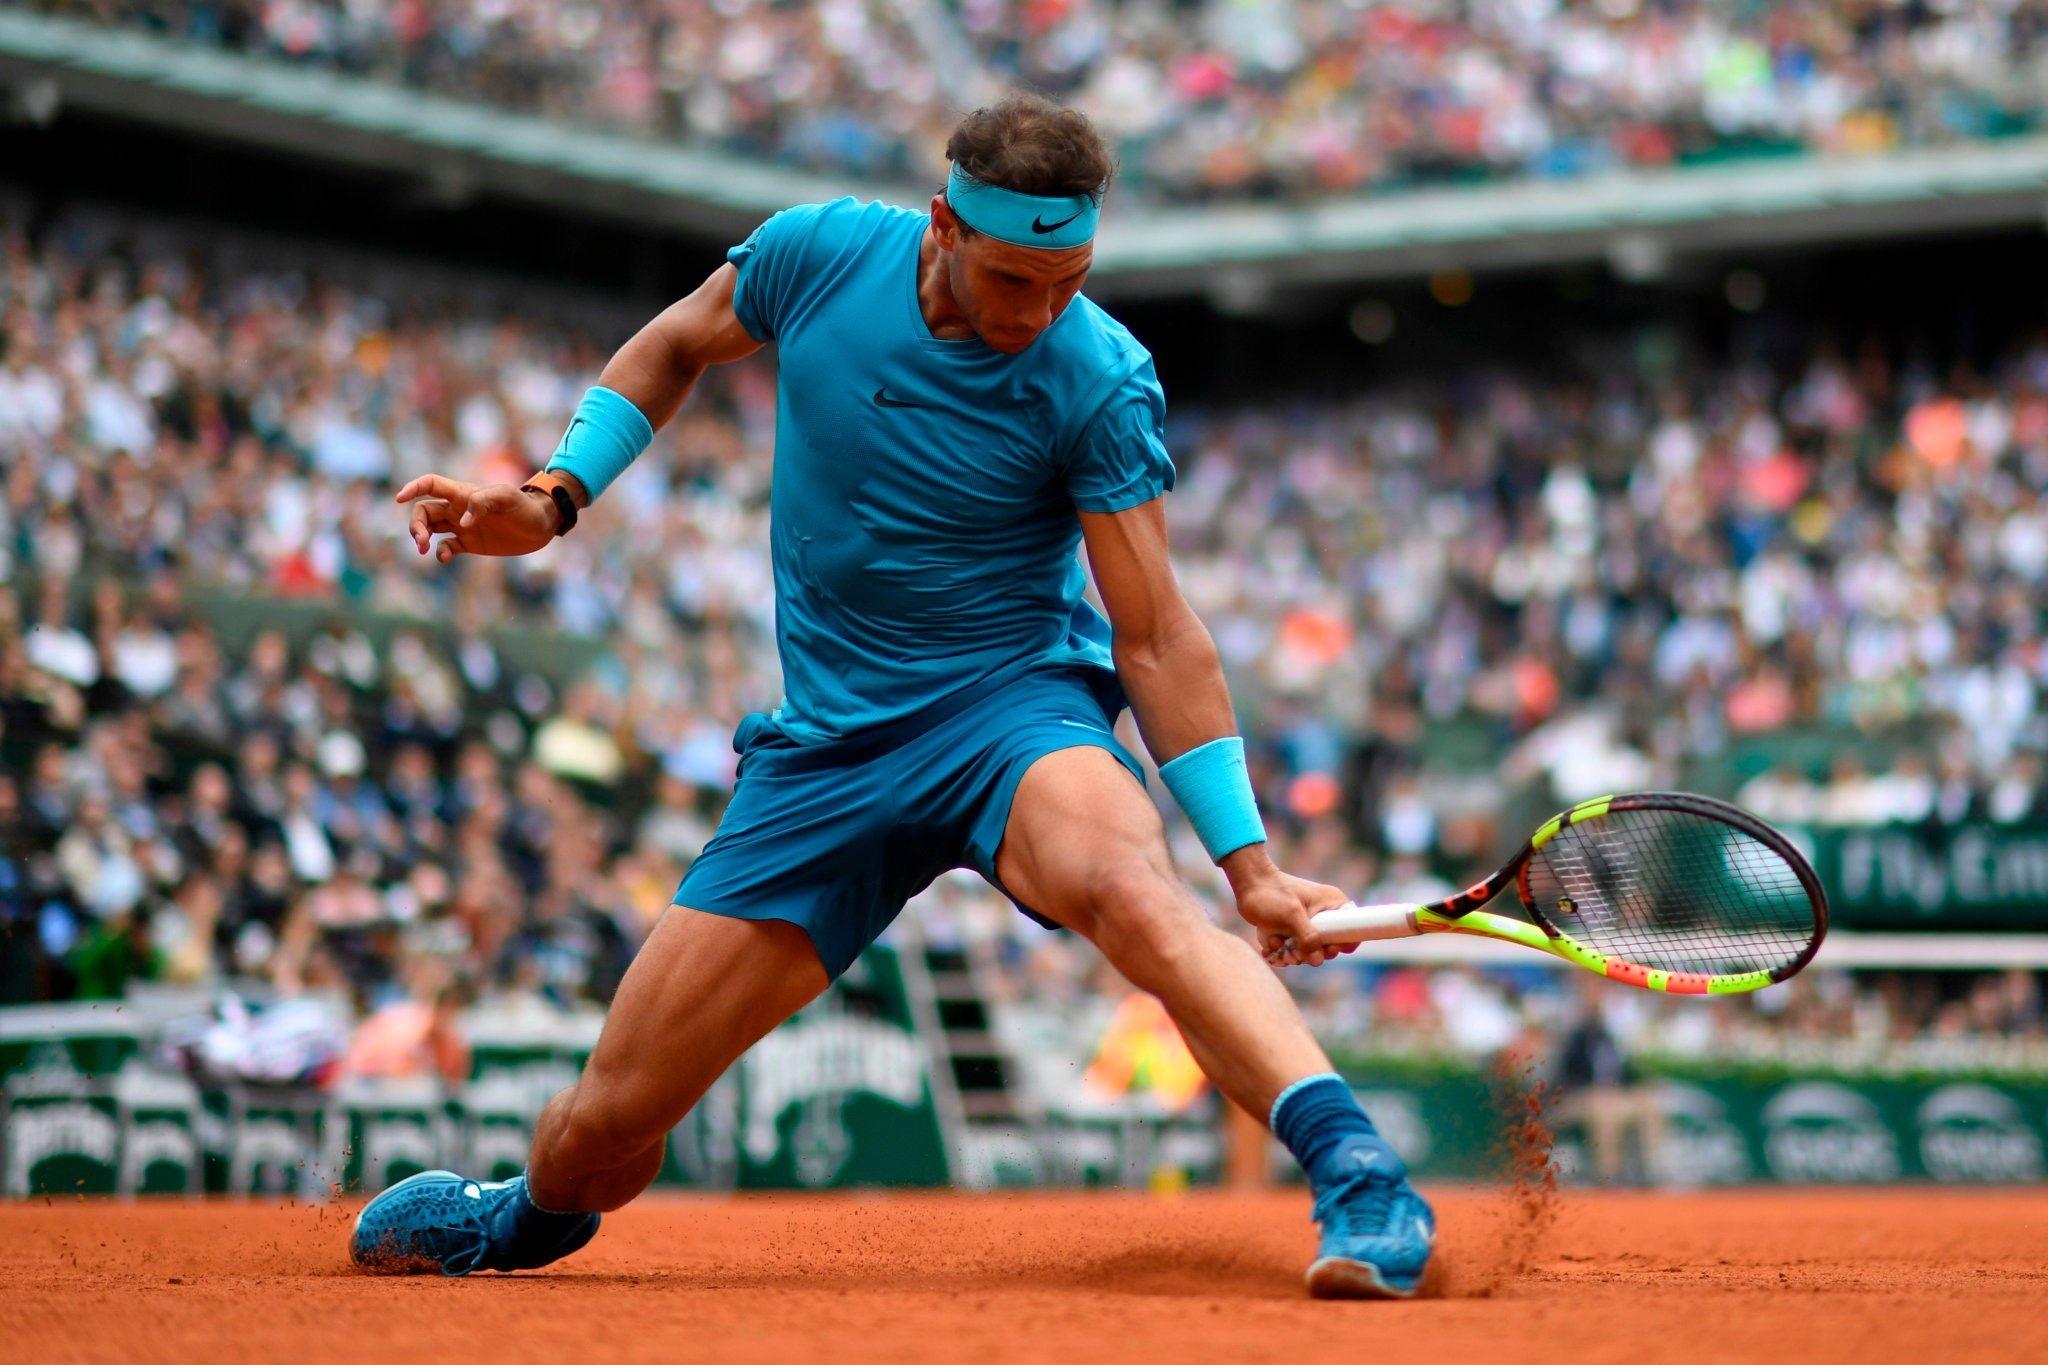 Rafa Rg 2018 Rafael Nadal Best Tennis Rackets Tennis Photos